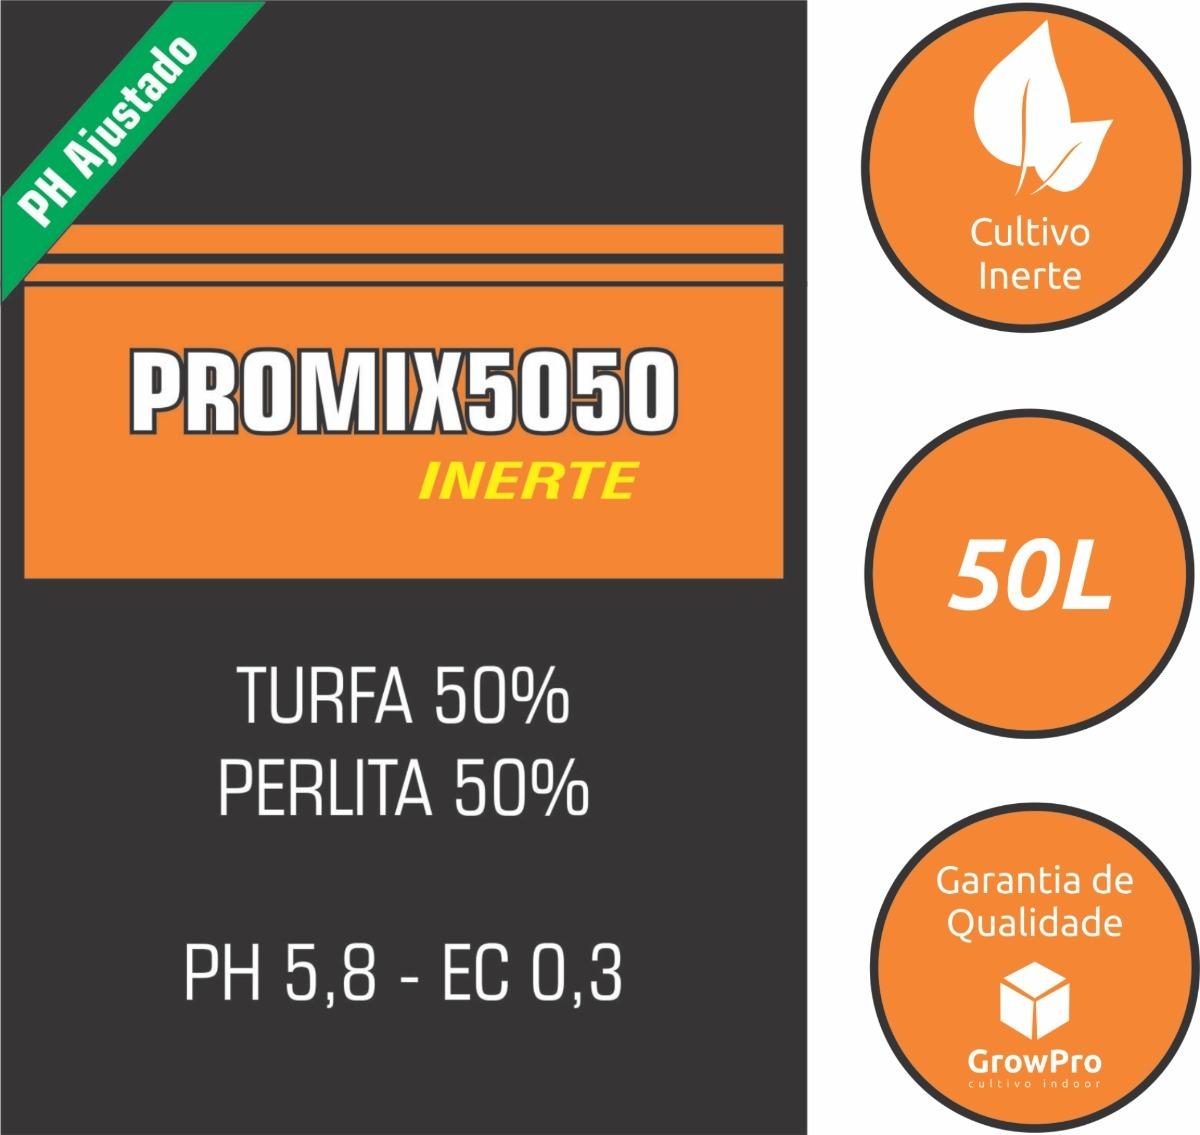 c86e272ab495 Substrato Inerte Promix 5050 50l - Turfa 50% + Perlita 50% - R  69 ...